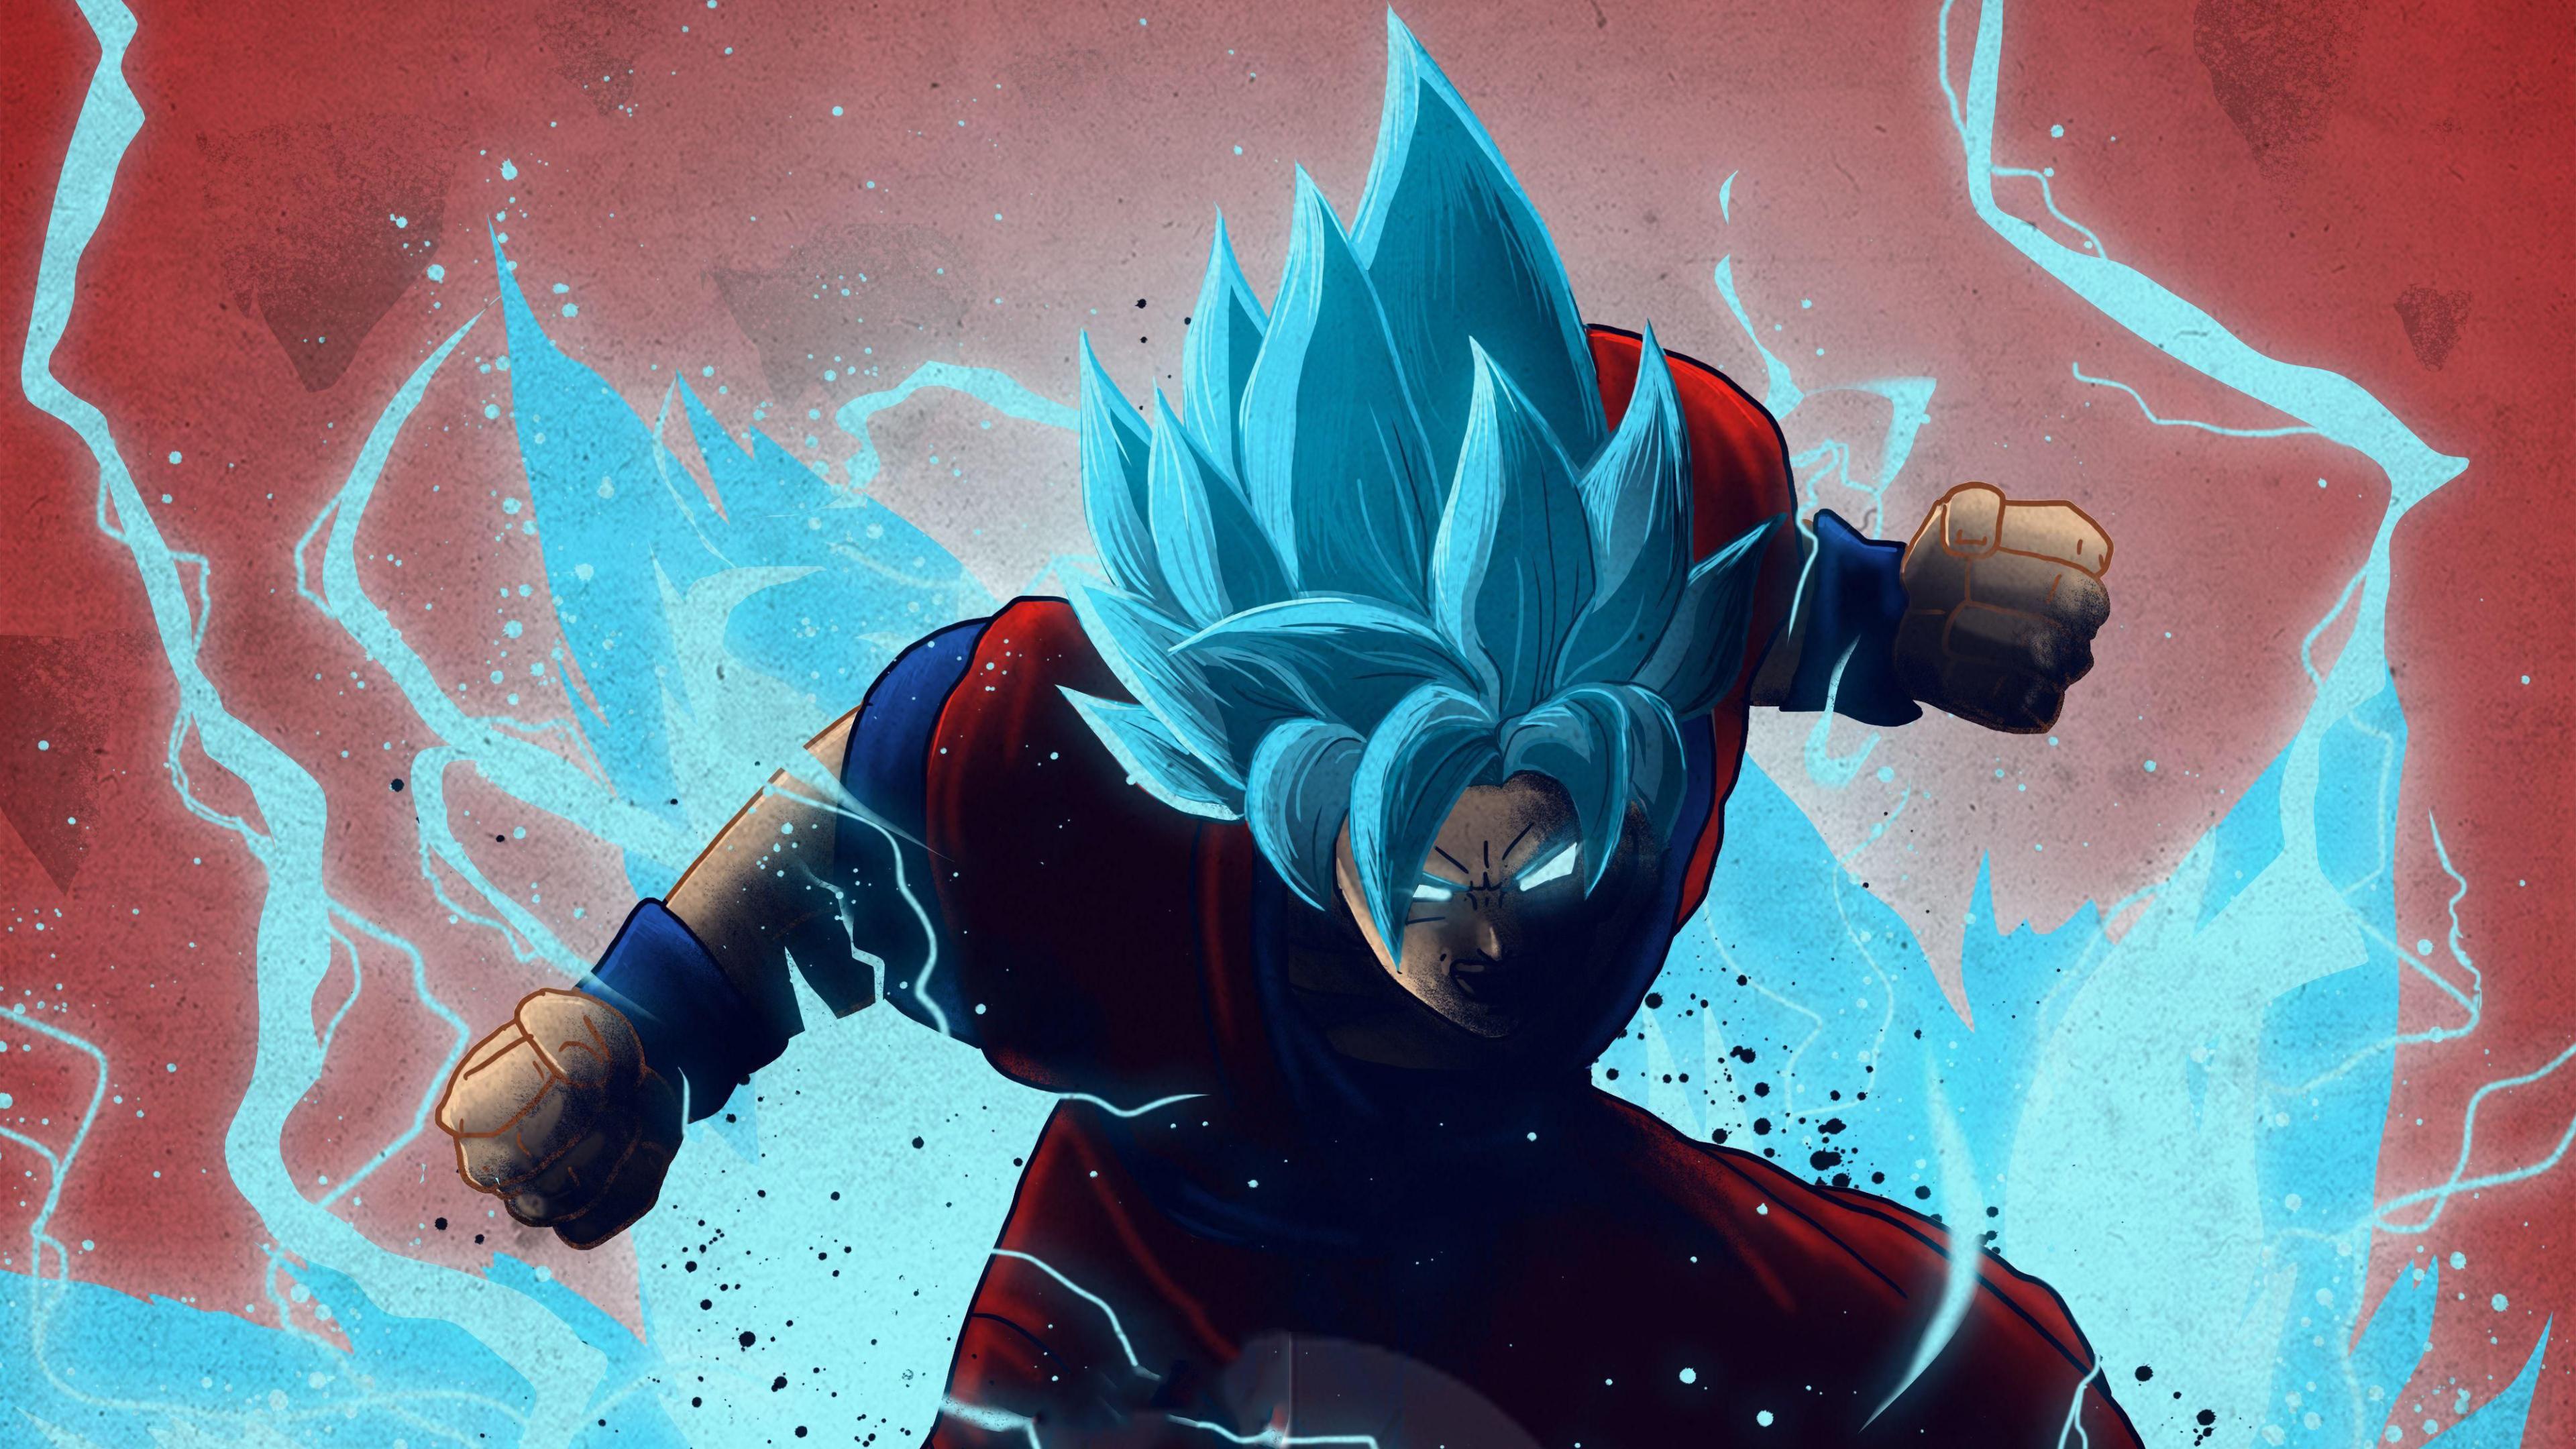 3840x2160 Goku Dragon Ball 4K Art 4K Wallpaper, HD Anime ...